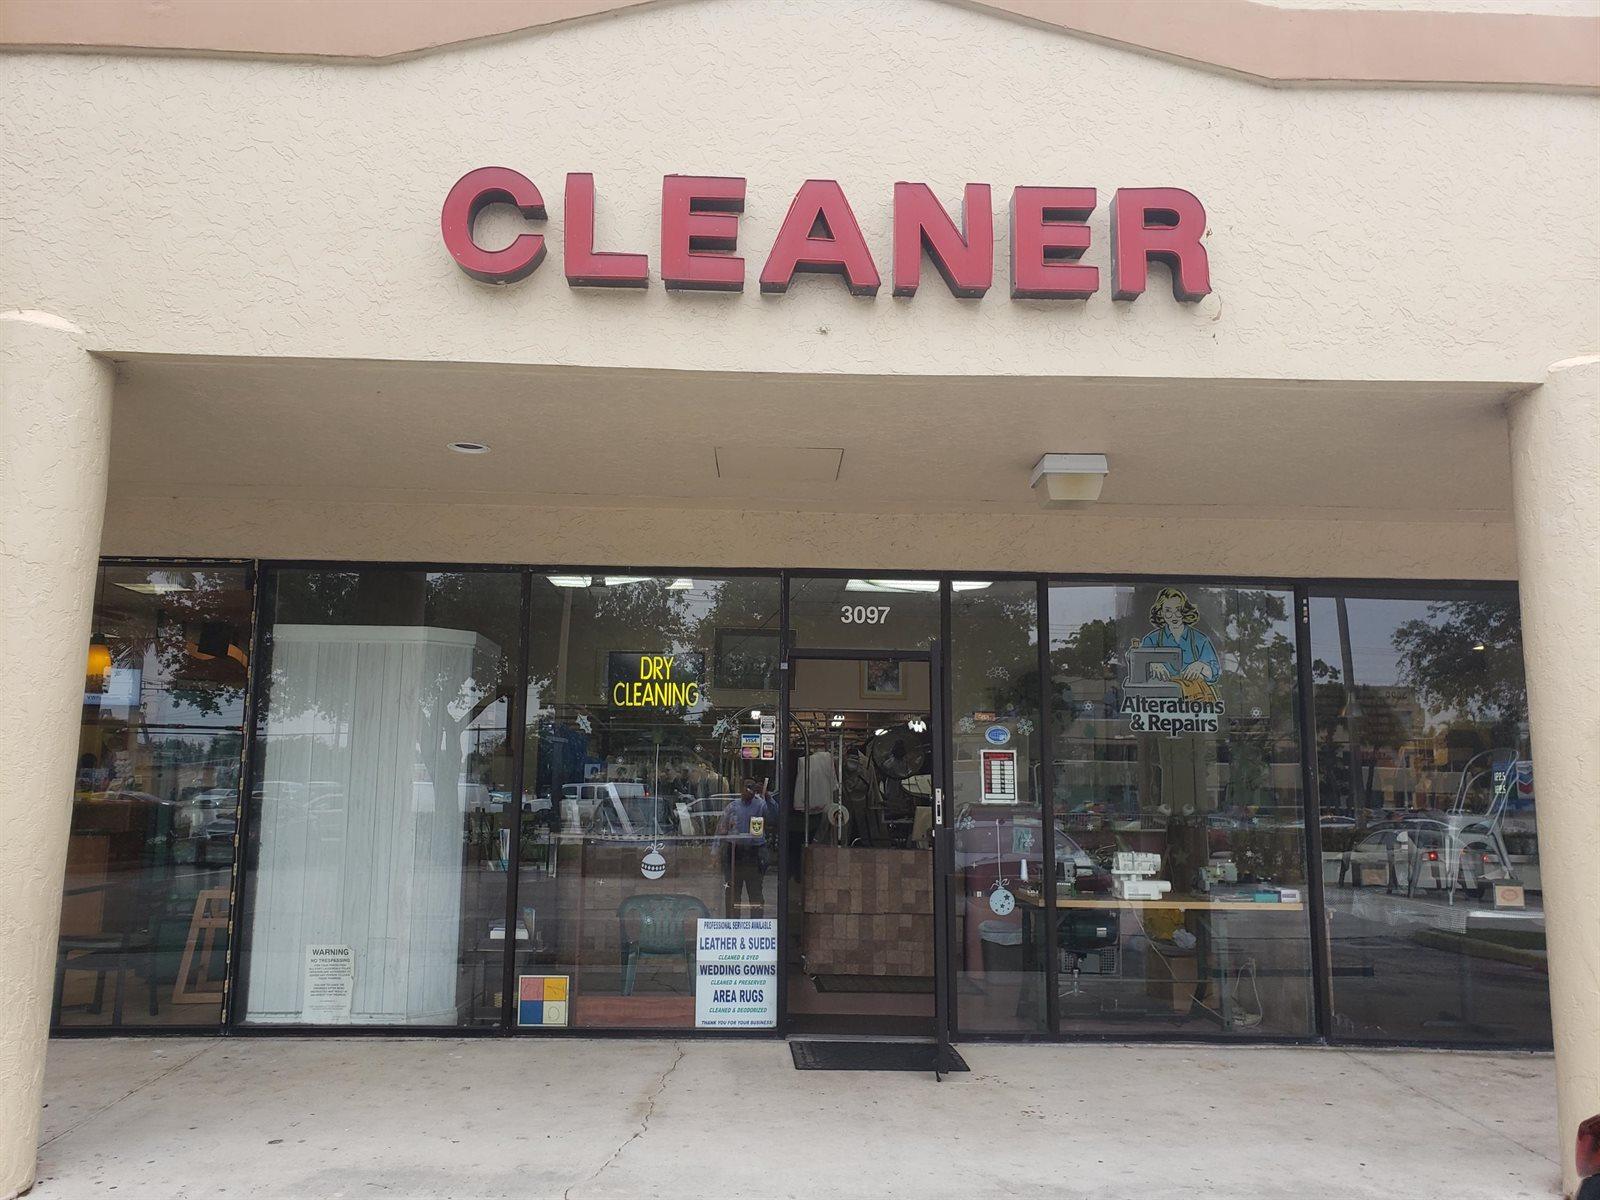 West Cypress Creek Road, Fort Lauderdale, FL 33309